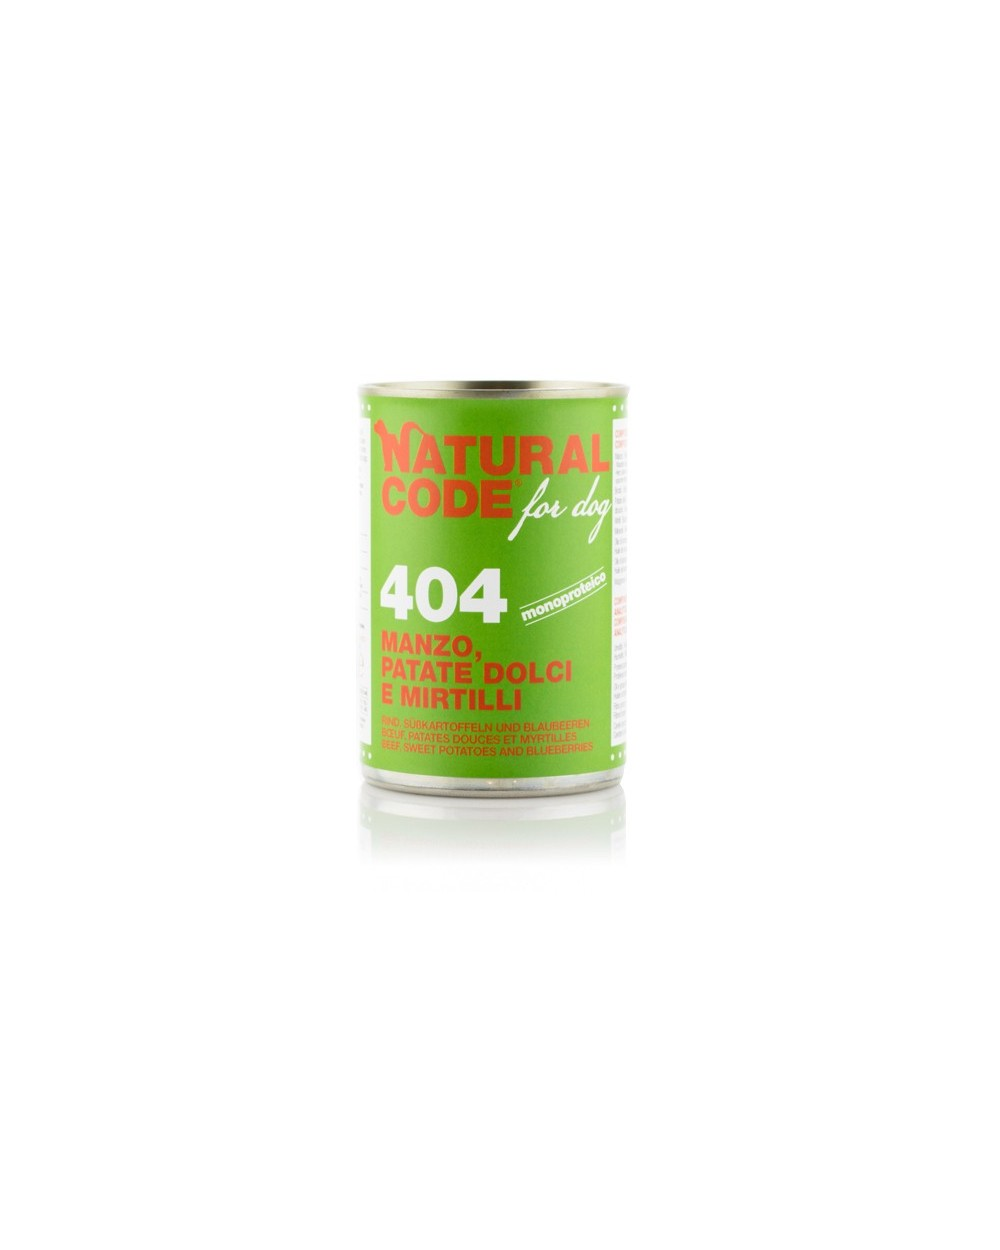 Natural Code Patè 404 Manzo Patate Dolci e Mirtilli